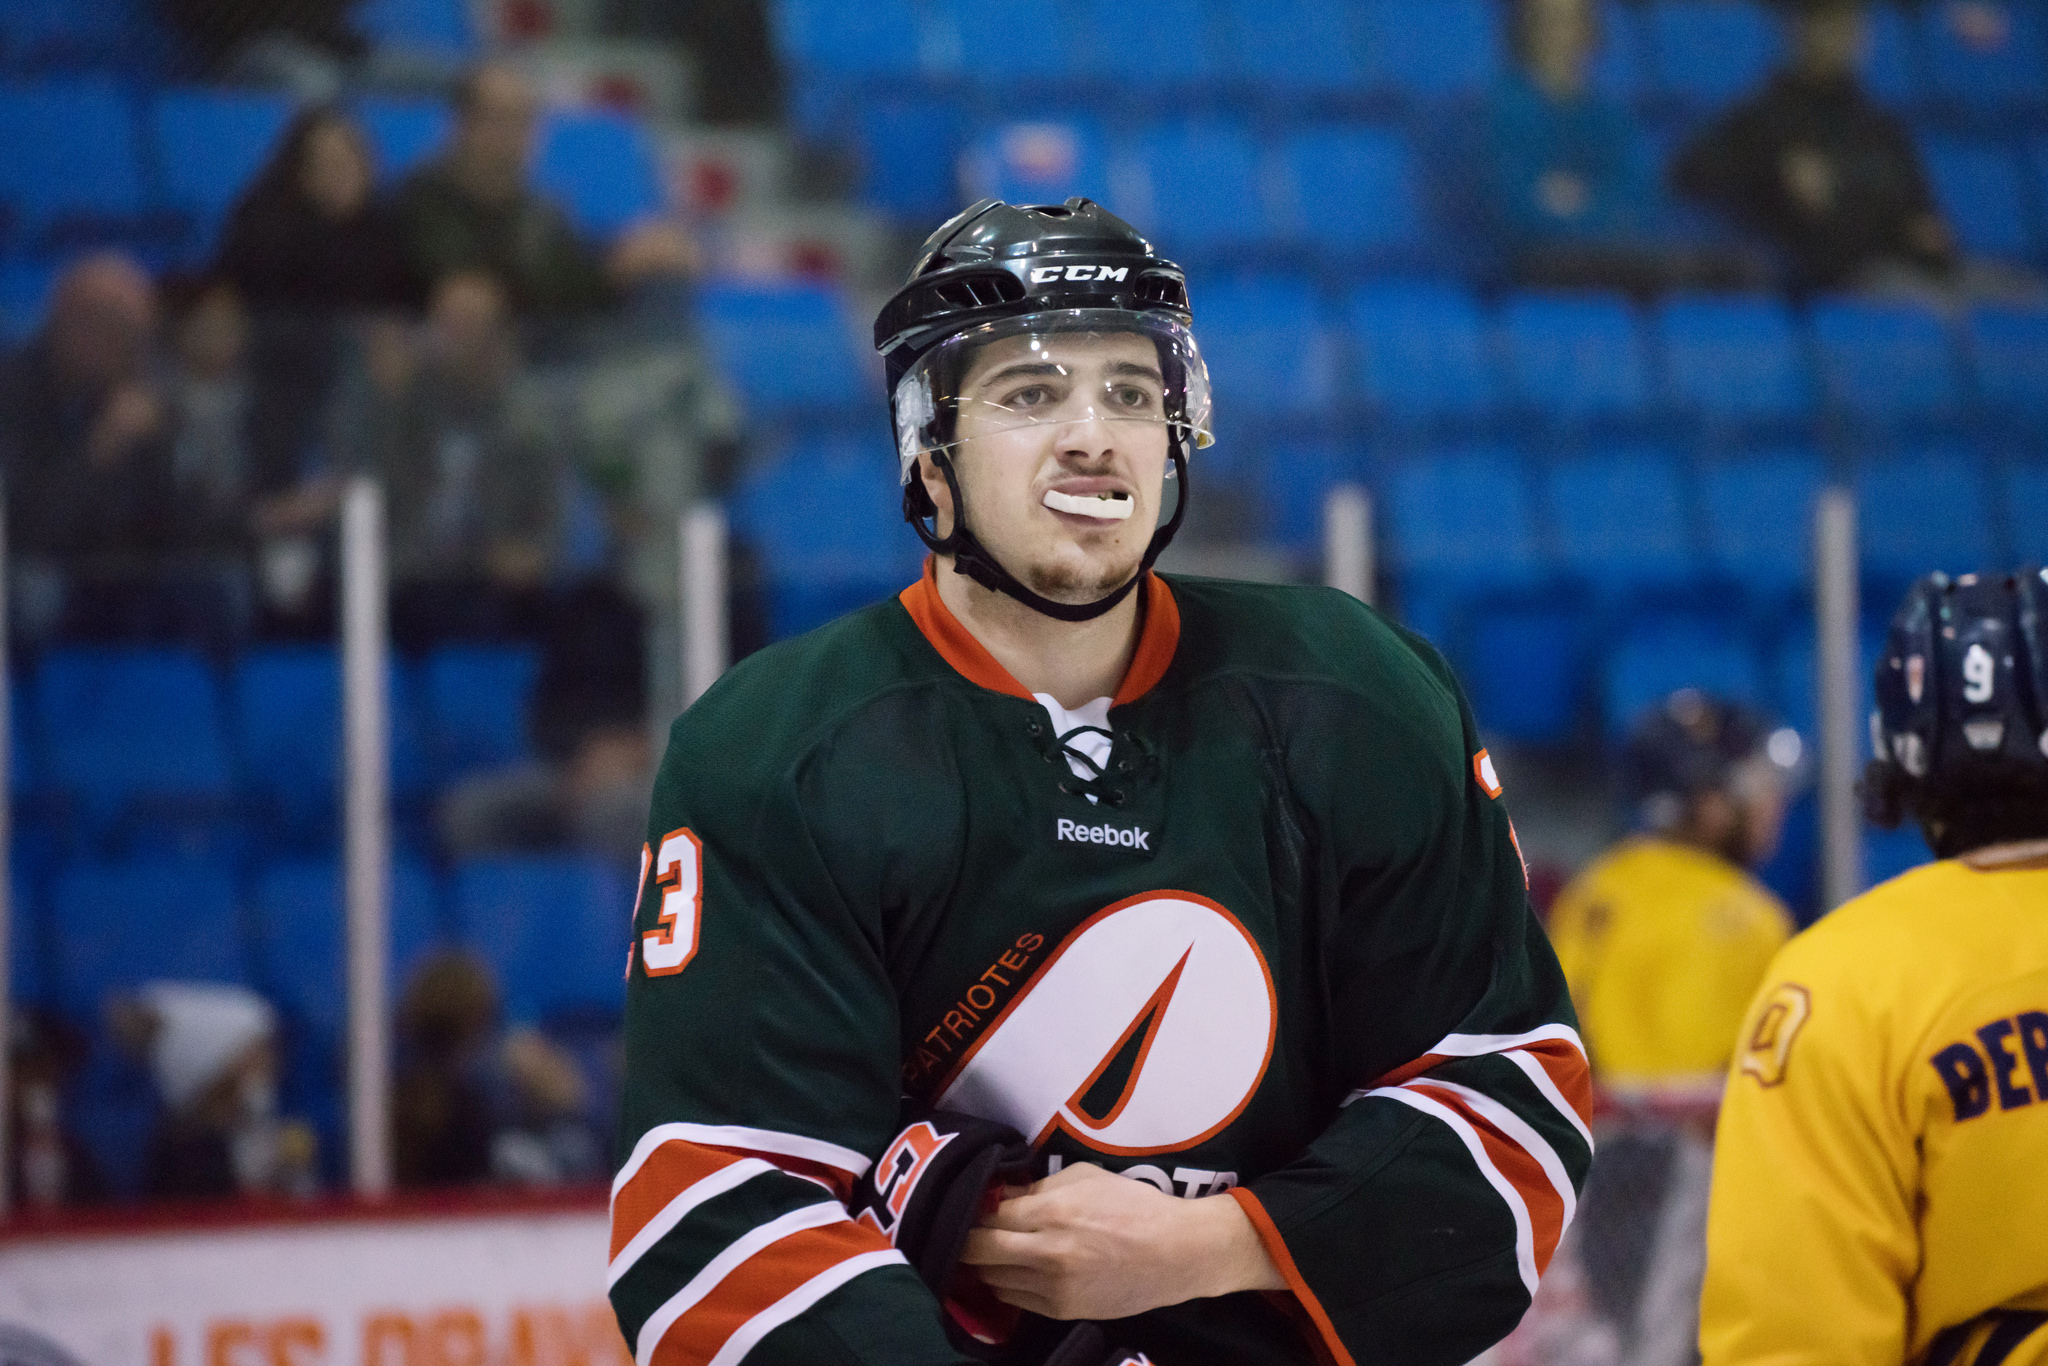 Patriotes hockey: Seconde victoire face à Windsor - Zone Campus